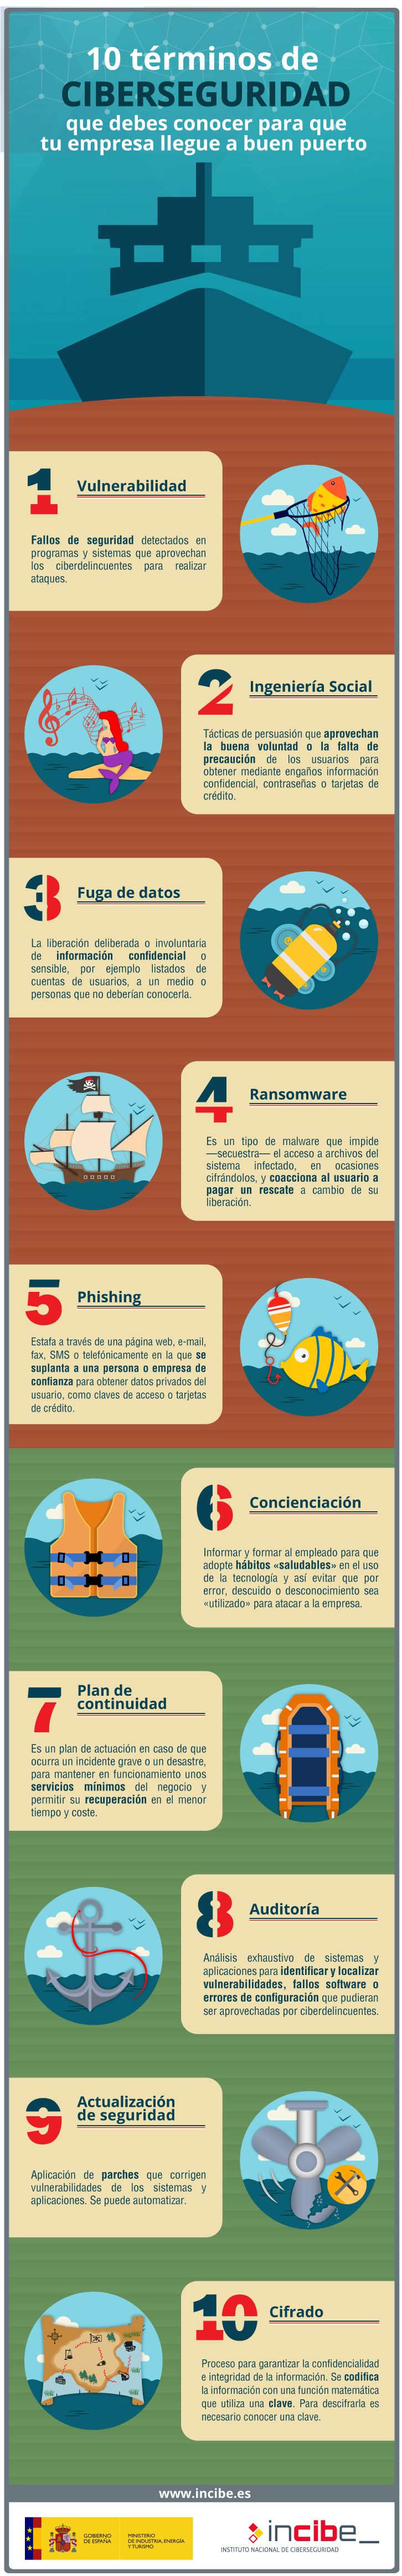 10 términos sobre ciberseguridad que debes conocer #infografia #infographic